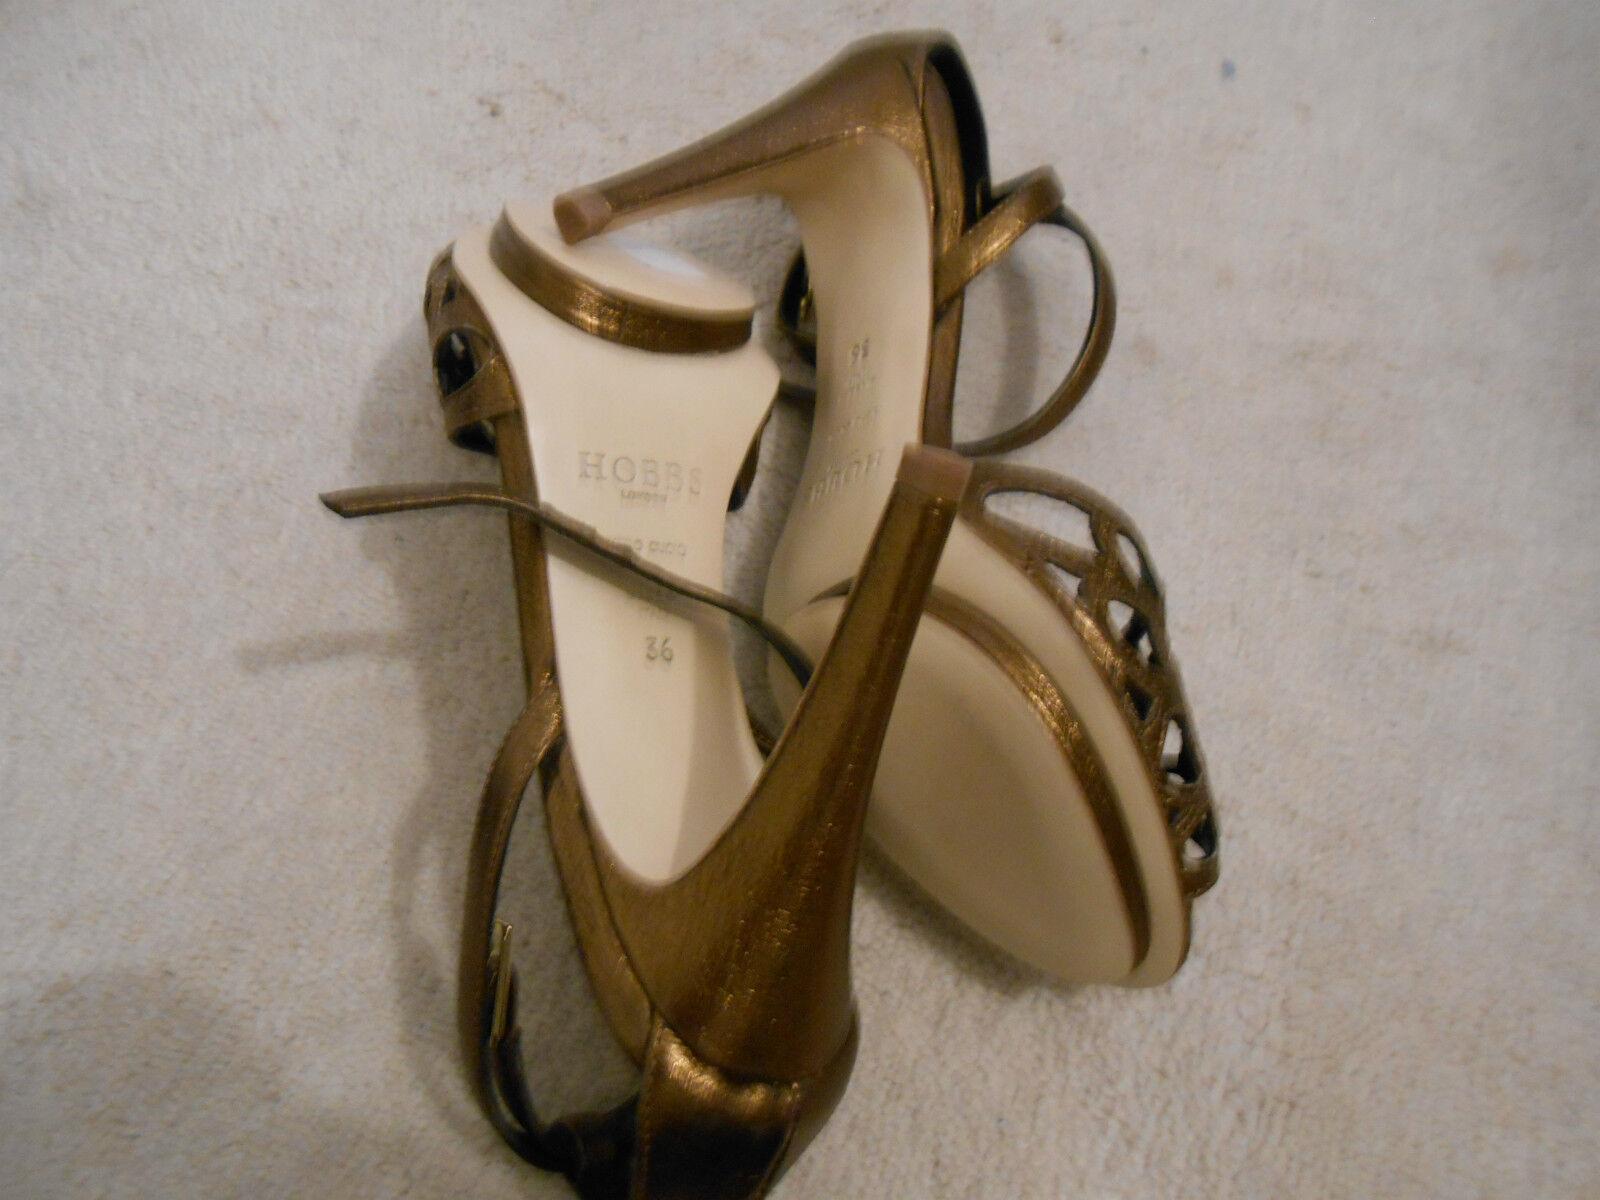 Descuento de liquidación Hobbs Bronze Leather Stiletto Heel Party Shoes Sandals (NEW) size 3.5-149.00